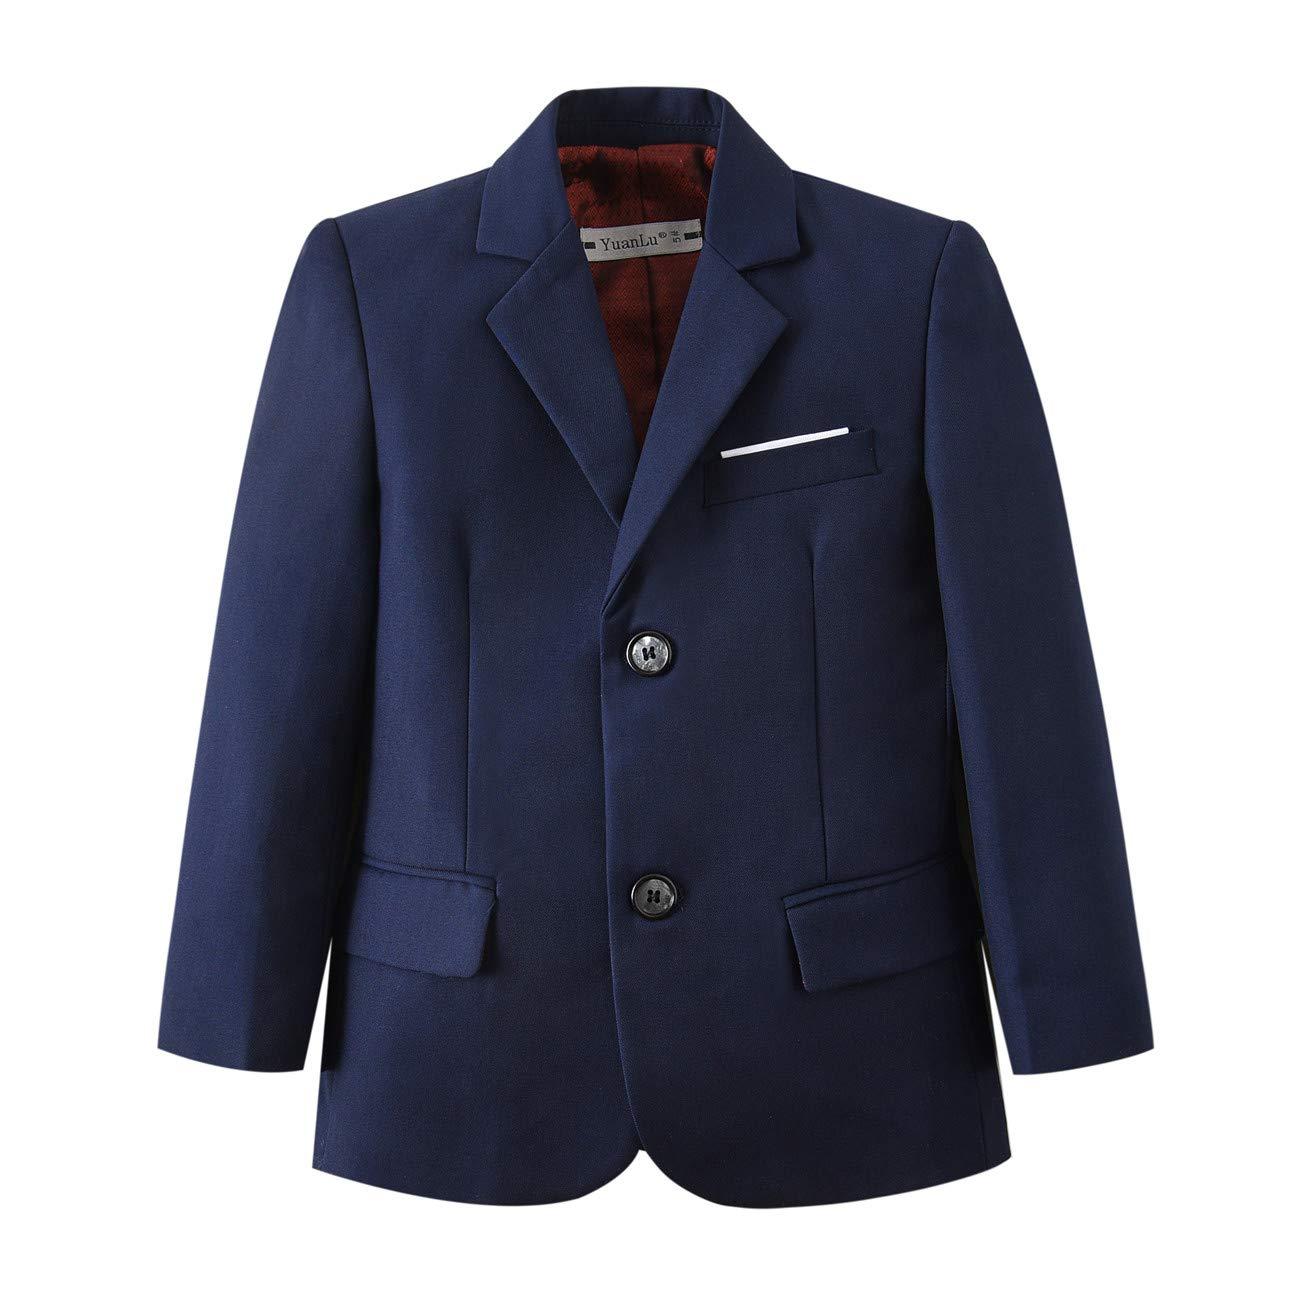 YuanLu Toddlers Boys Blazer Sport Coat for Kids Navy Blue Size 2T